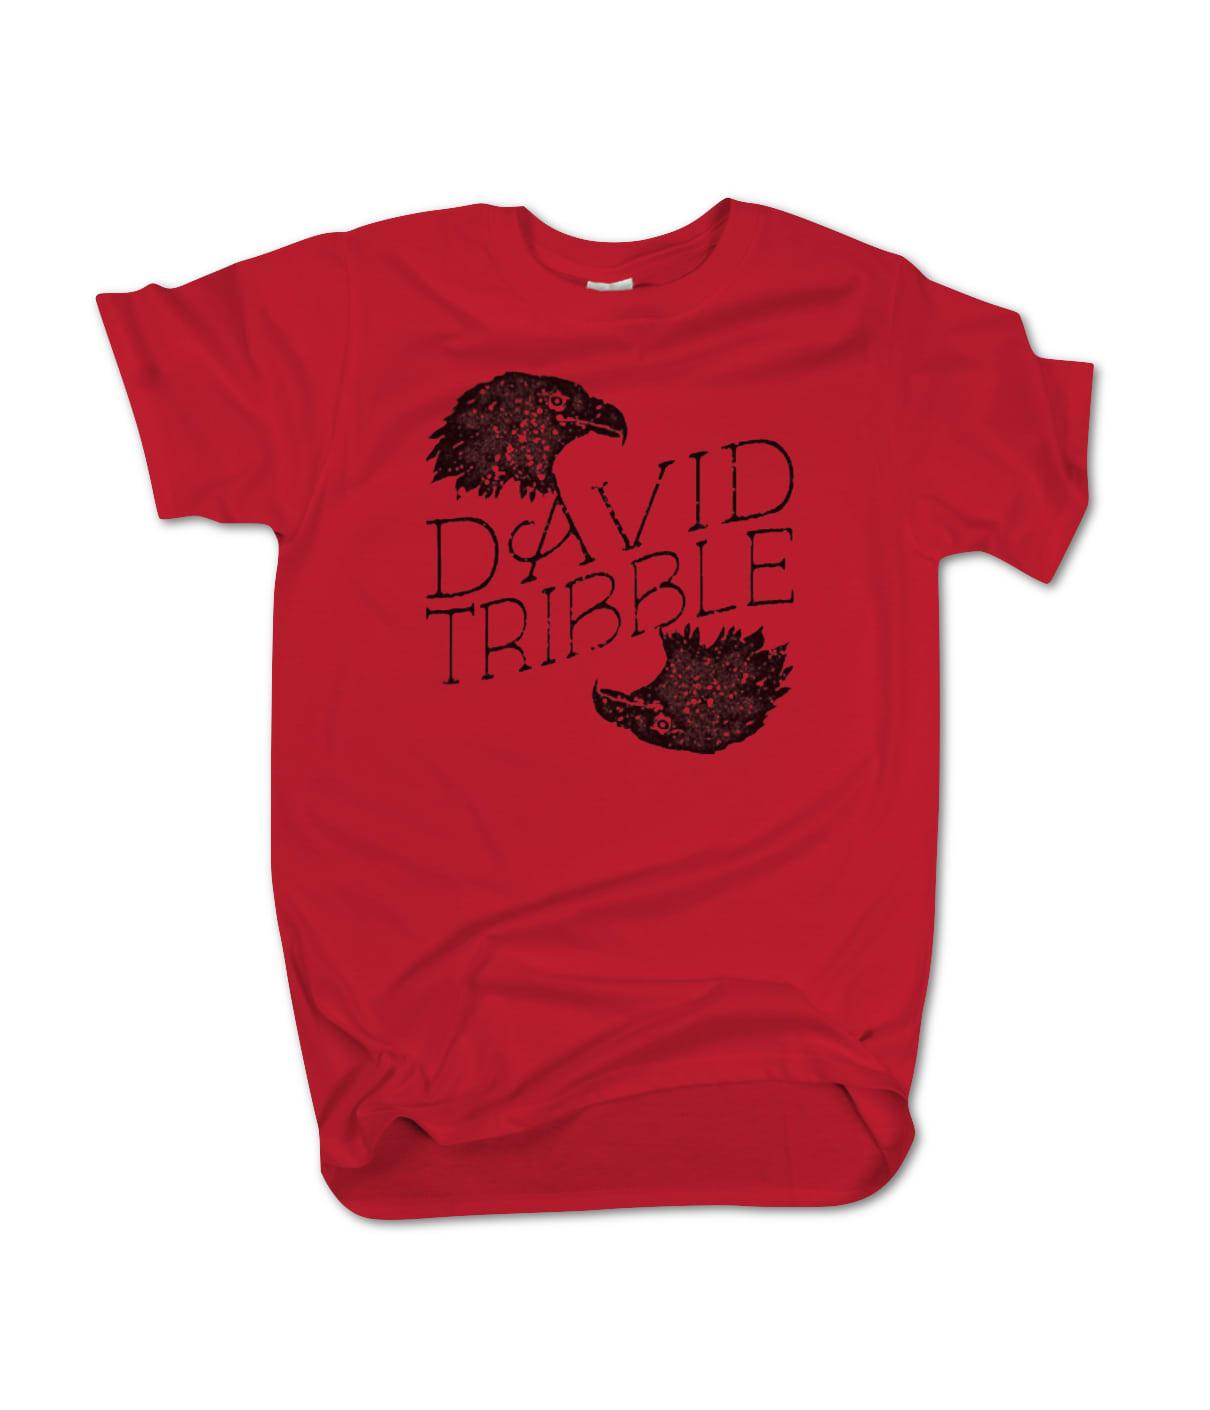 David tribble crow round fade 1530374322